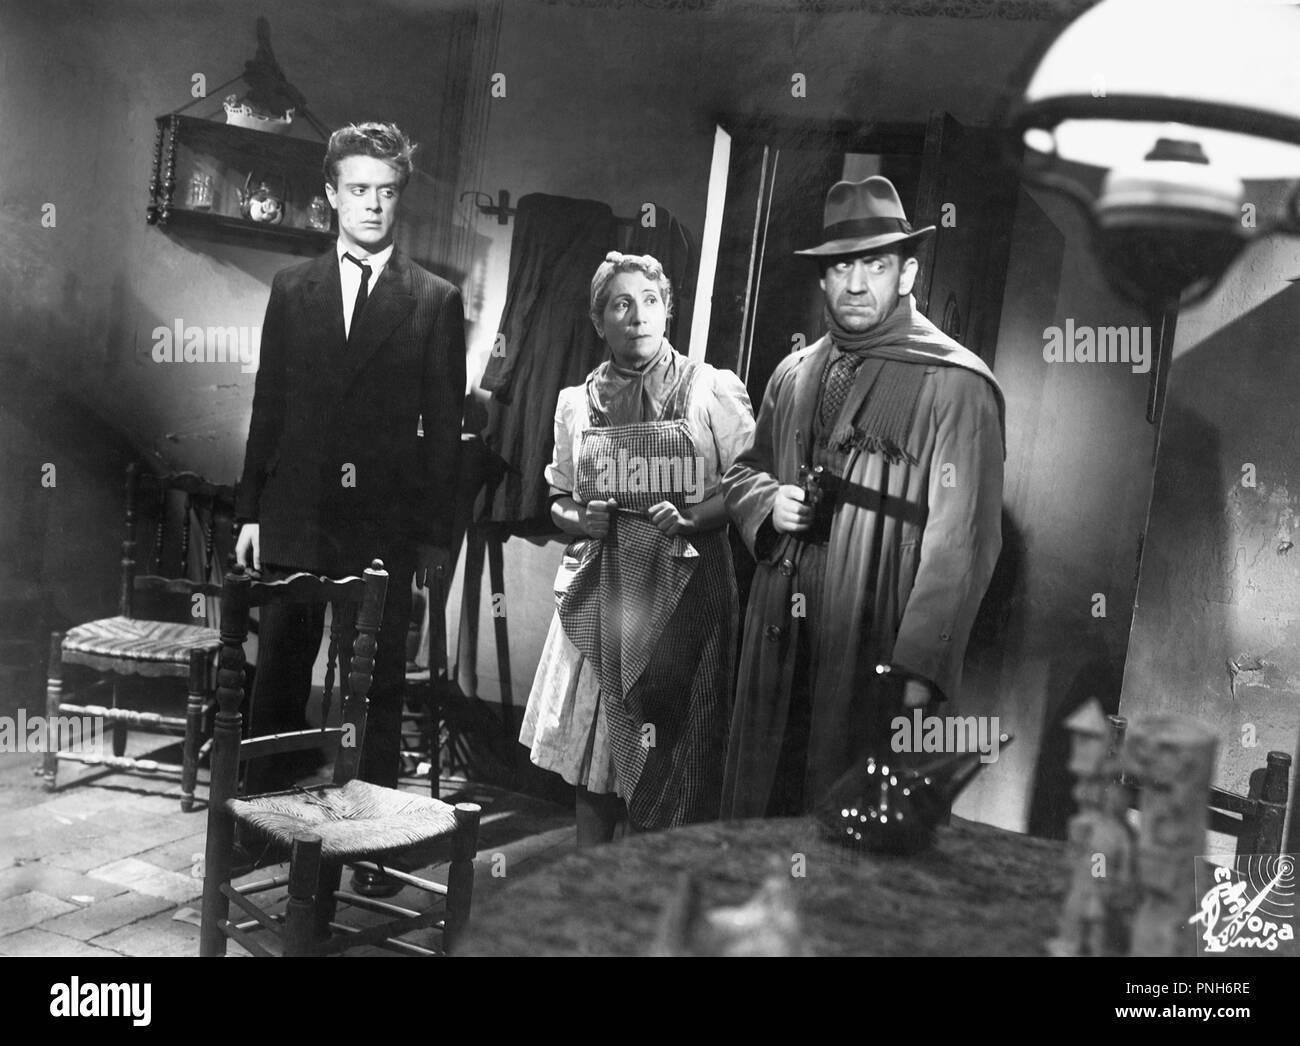 Original film title: HOMBRES SIN HONOR. English title: HOMBRES SIN HONOR. Year: 1944. Director: IGNACIO F. IQUINO. Credit: EMISORA FILMS / Album - Stock Image